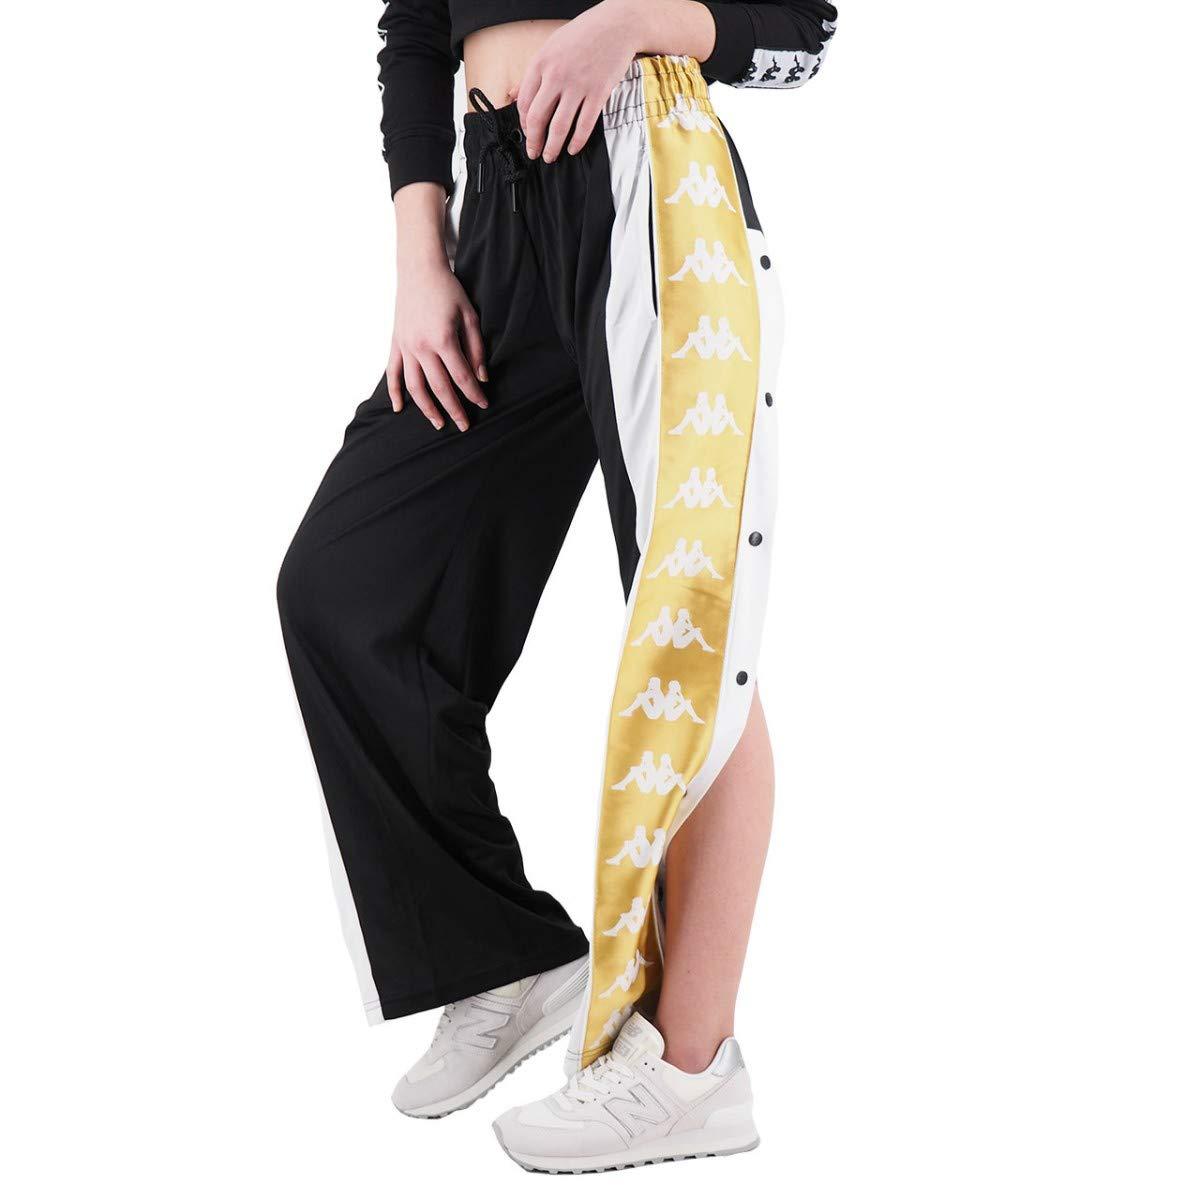 Pantalones 222 Banda 10 Negro Baish Kap 304i780 915 Kappa Ropa Brandknewmag Com